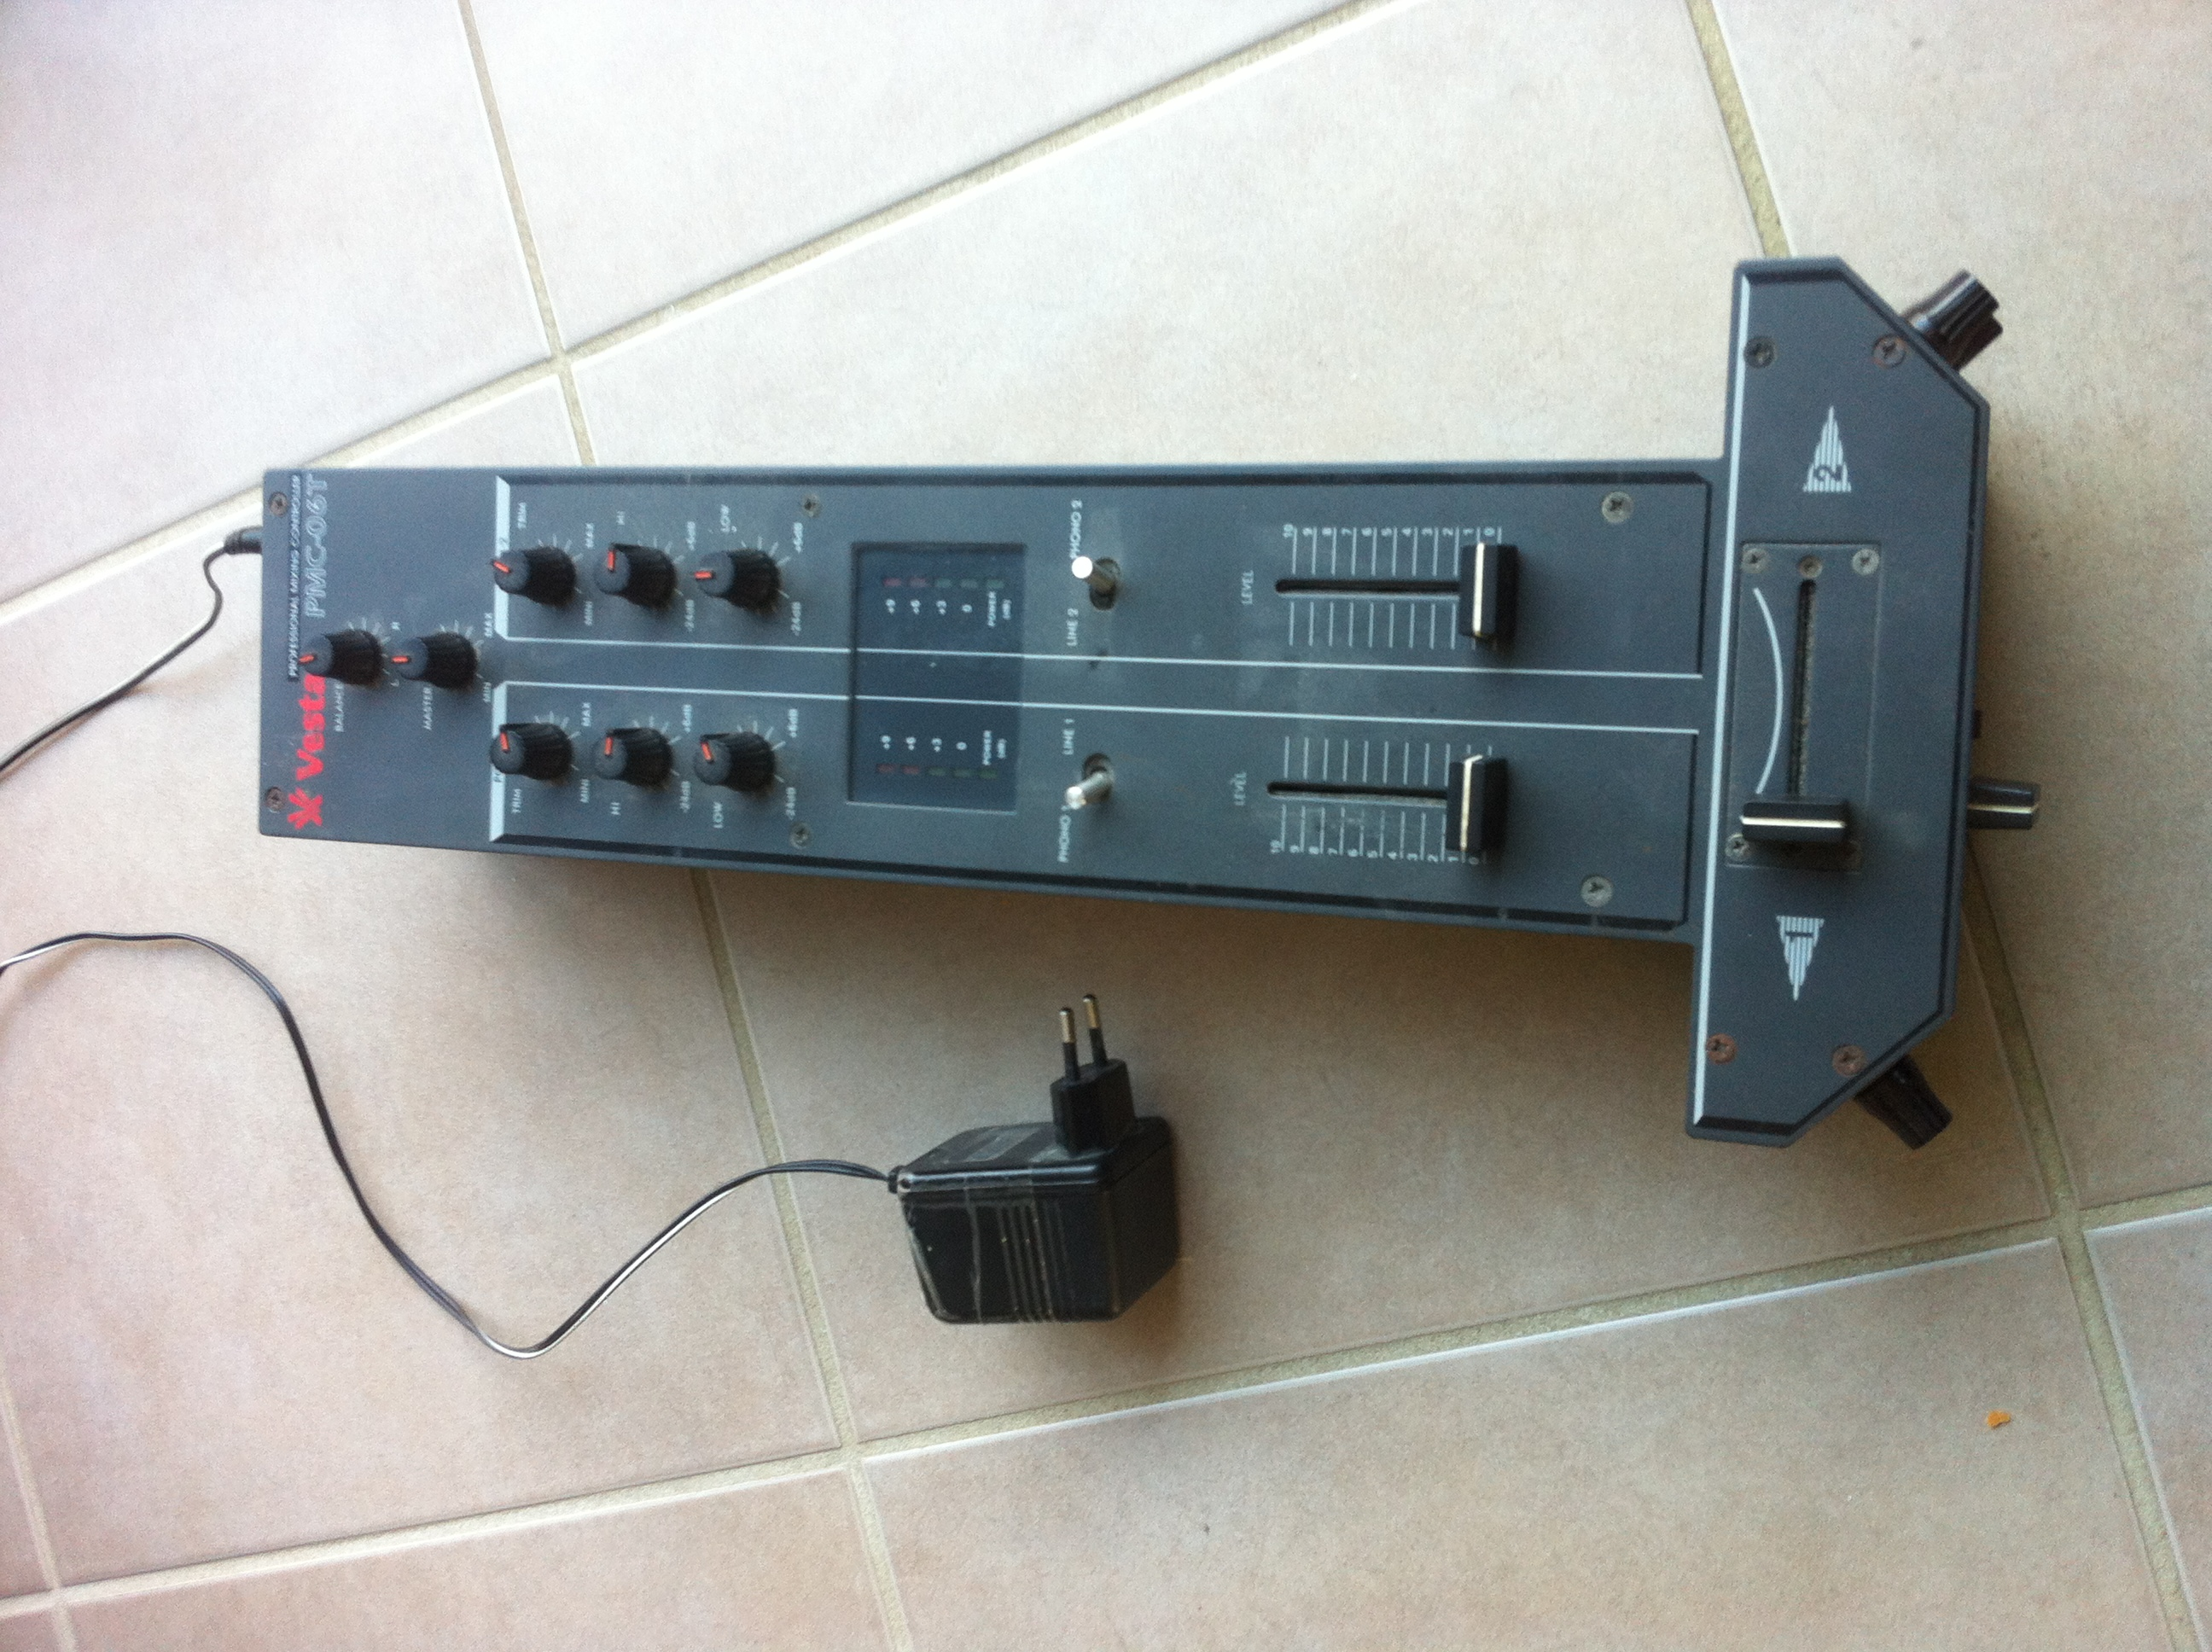 Vestax Pmc 06 Vestax Pmc-06 t Format Jpg